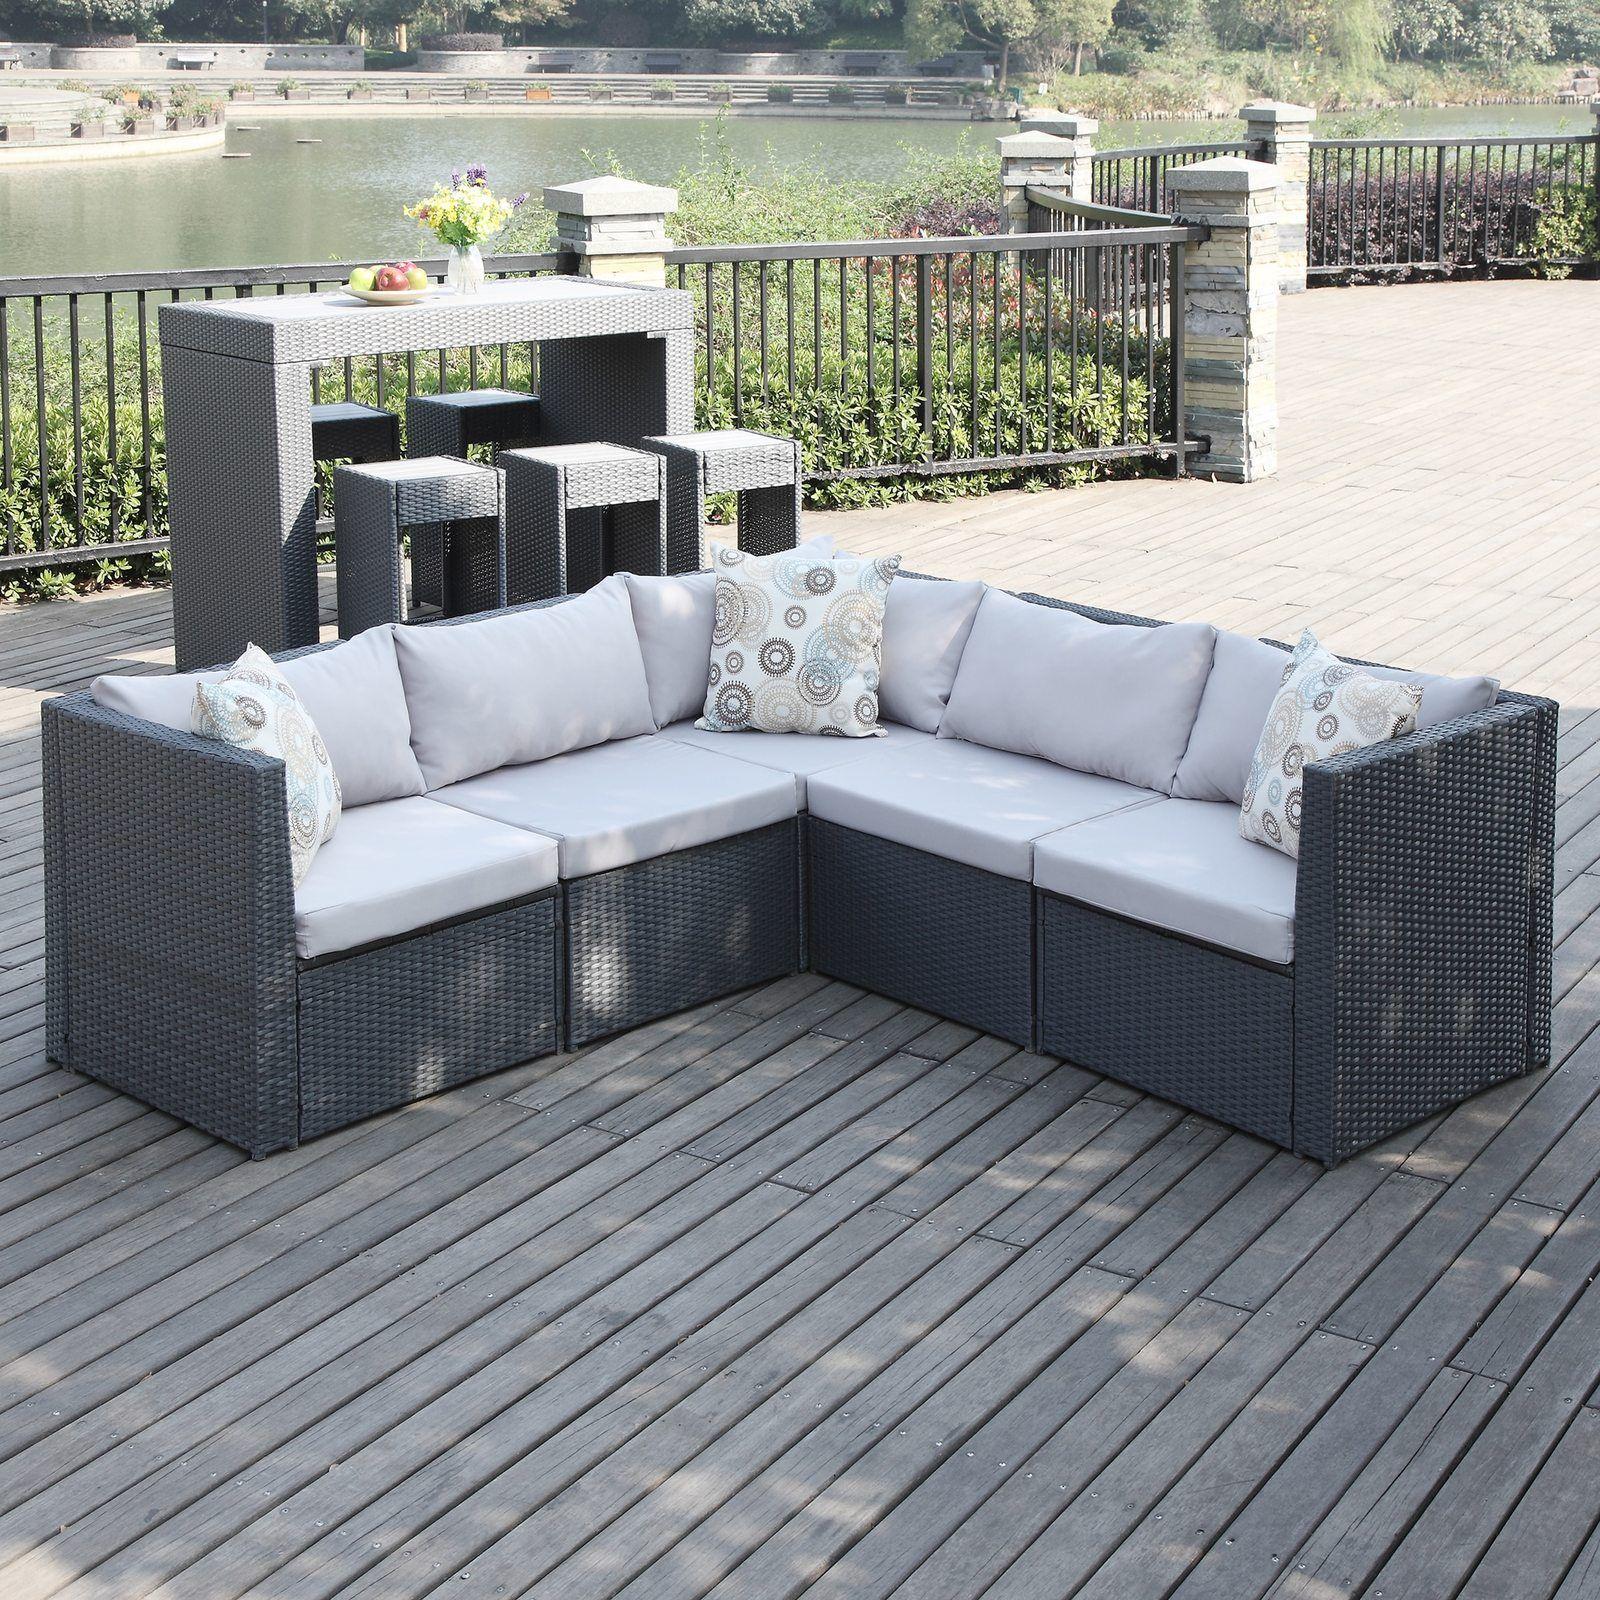 5 Piece Grey Outdoor Patio Furniture Sectional Set The Portfolio